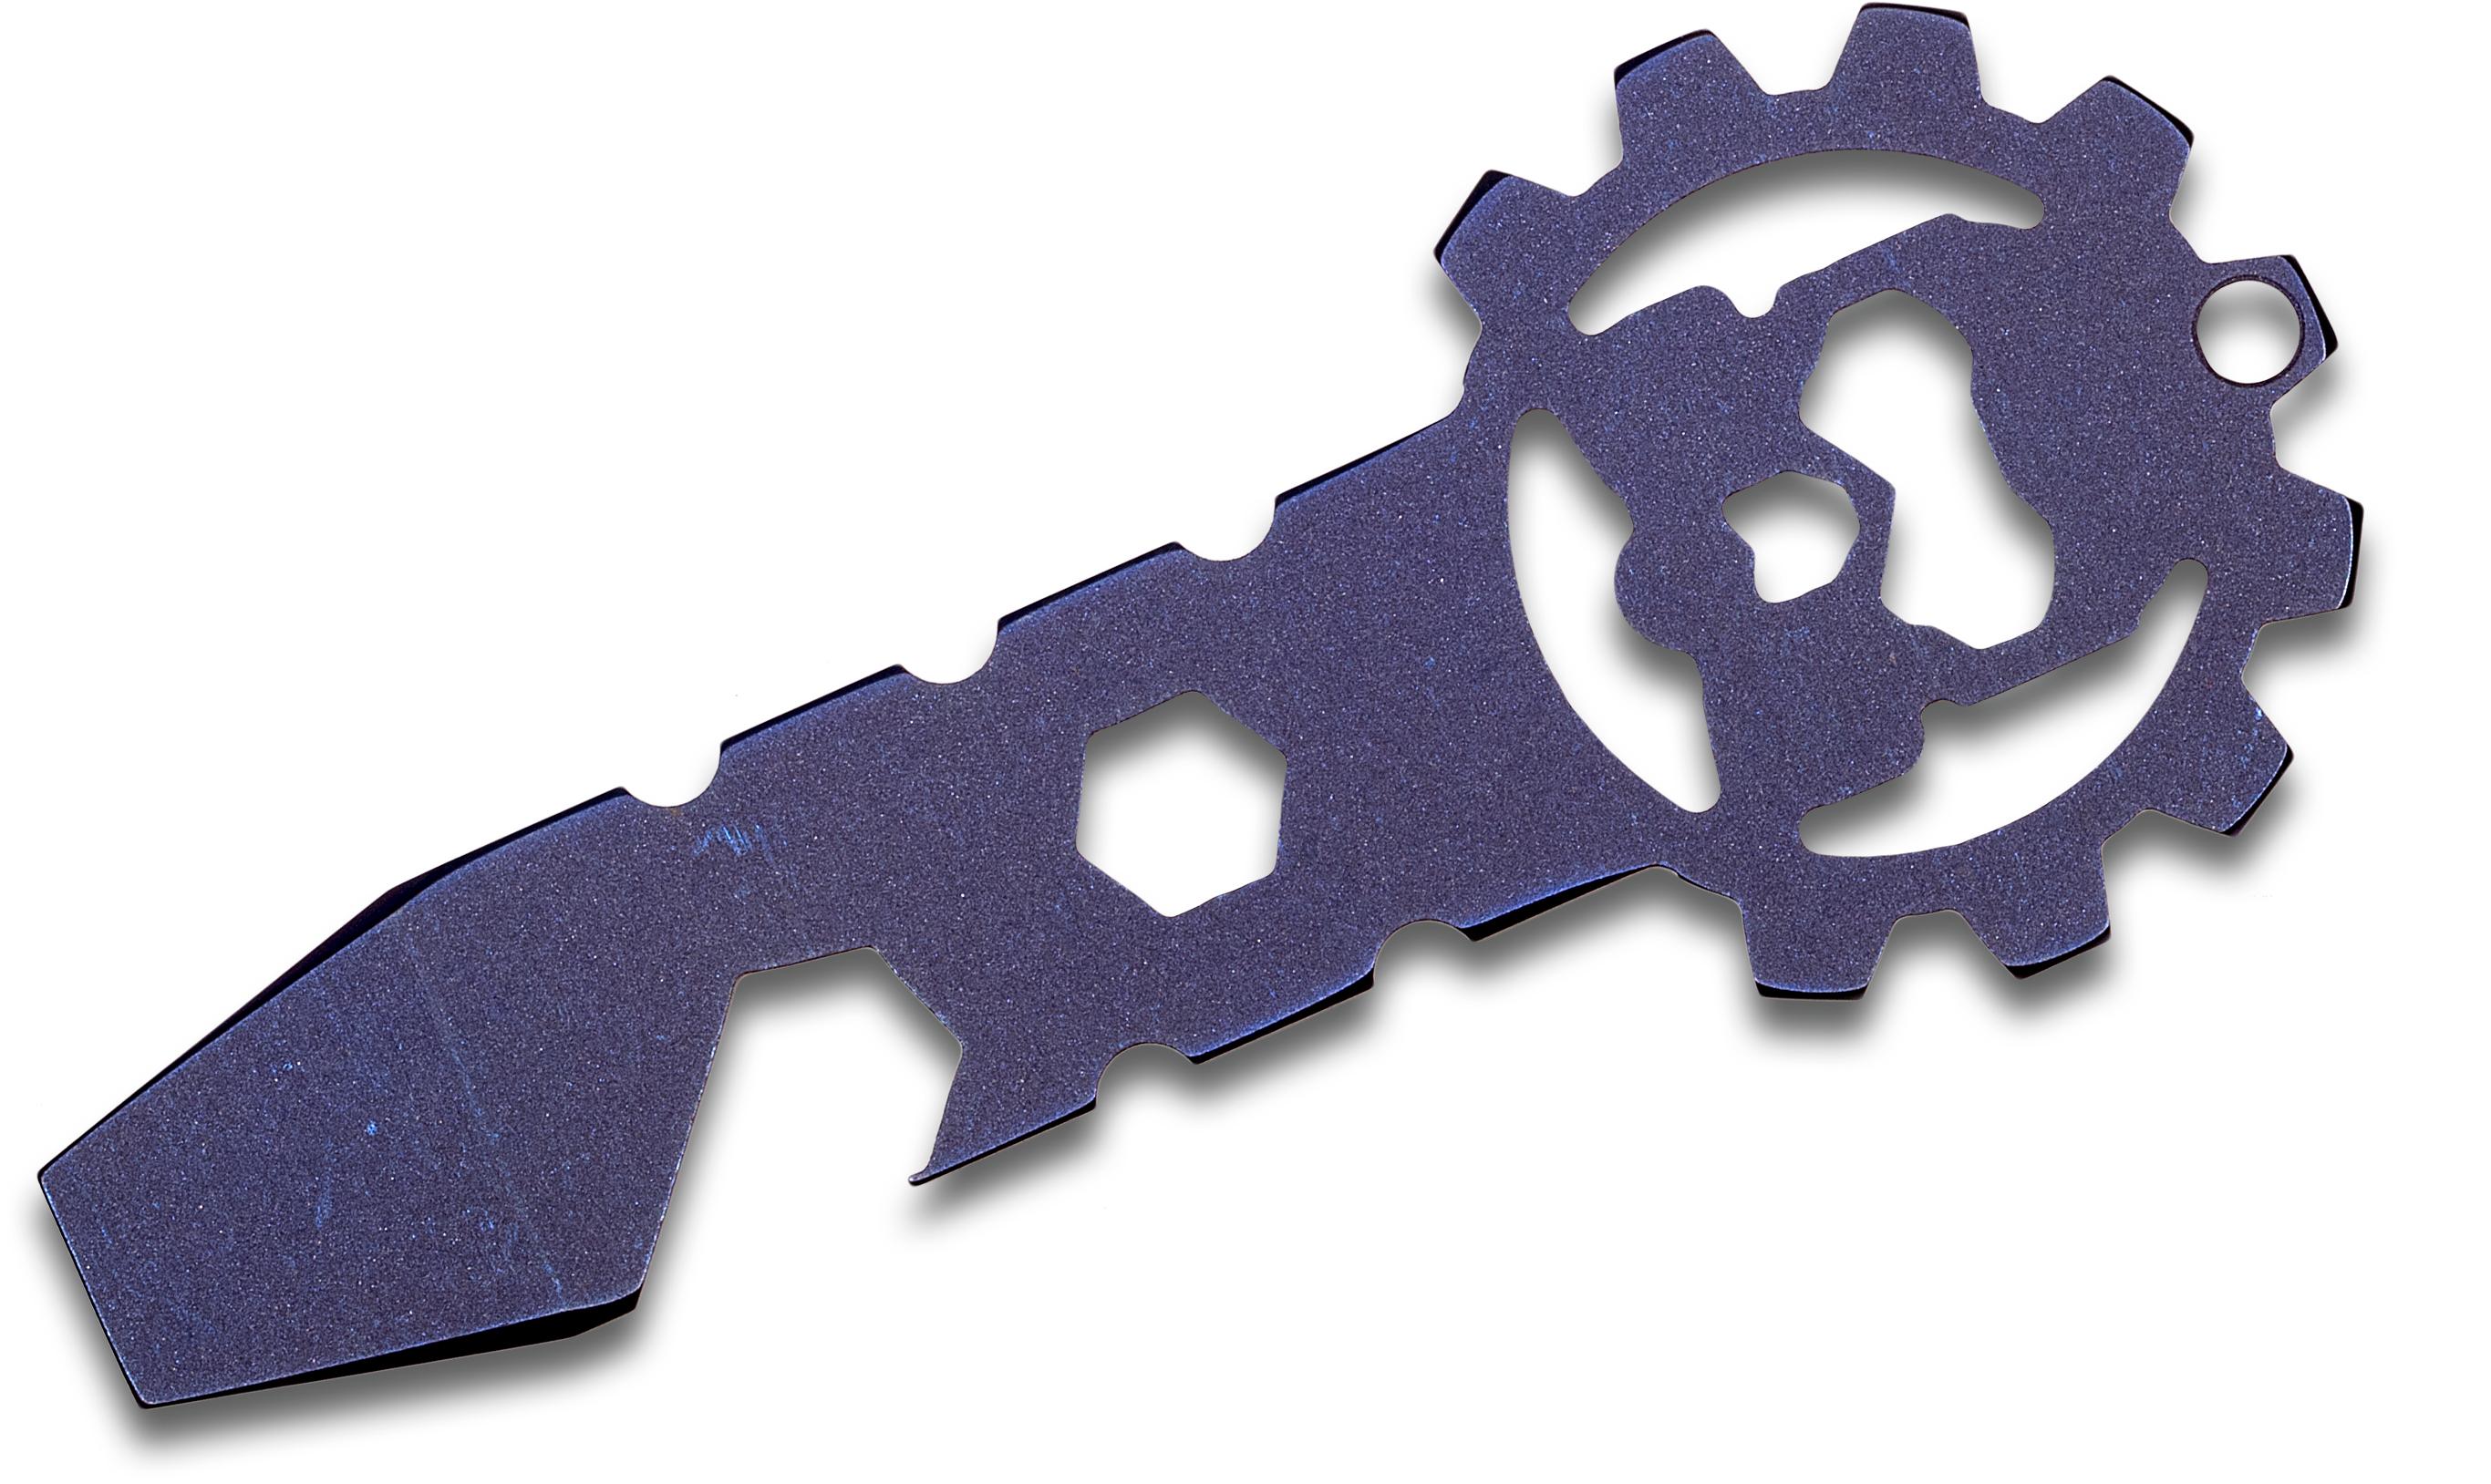 Smock Knives SmocKey Titanium Keychain Pocket Tool, Blue Anodized, 3.25 inch Overall